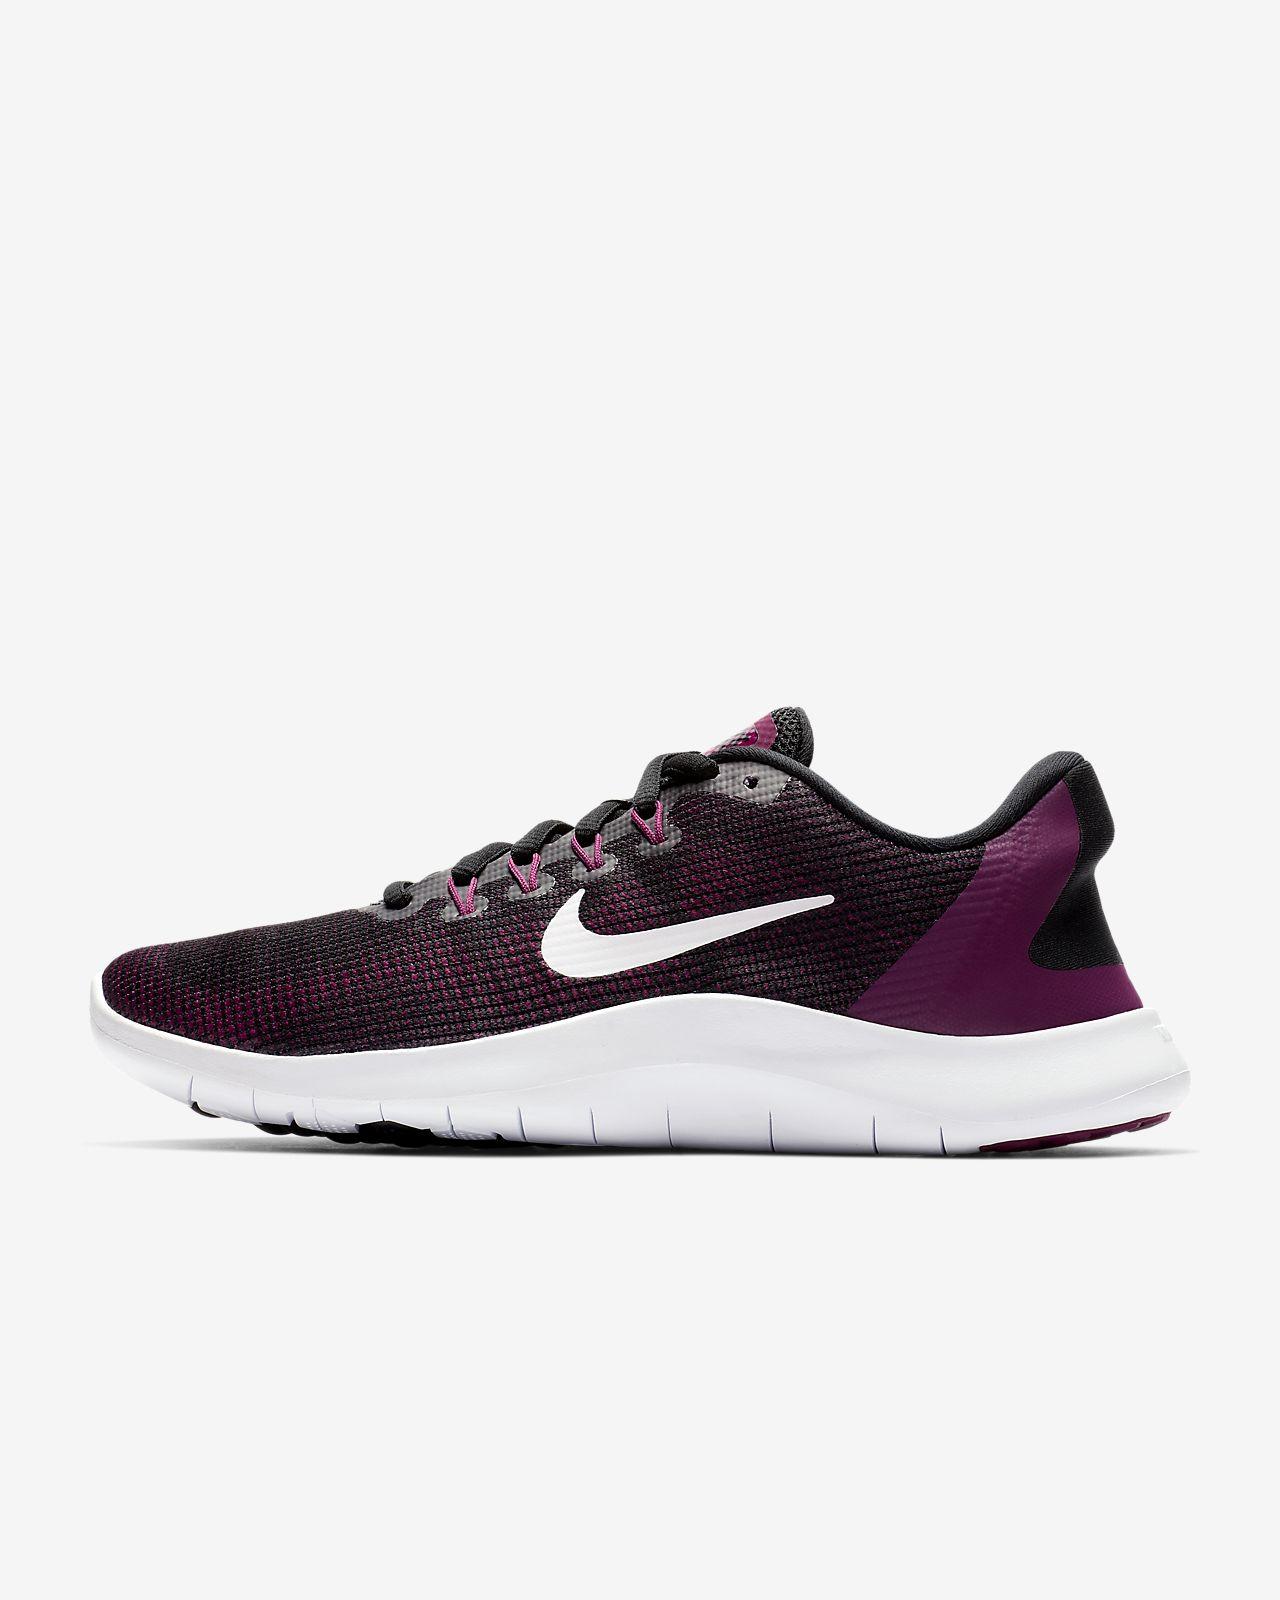 0081e44db6b Nike Flex RN 2018 Women's Running Shoe. Nike.com